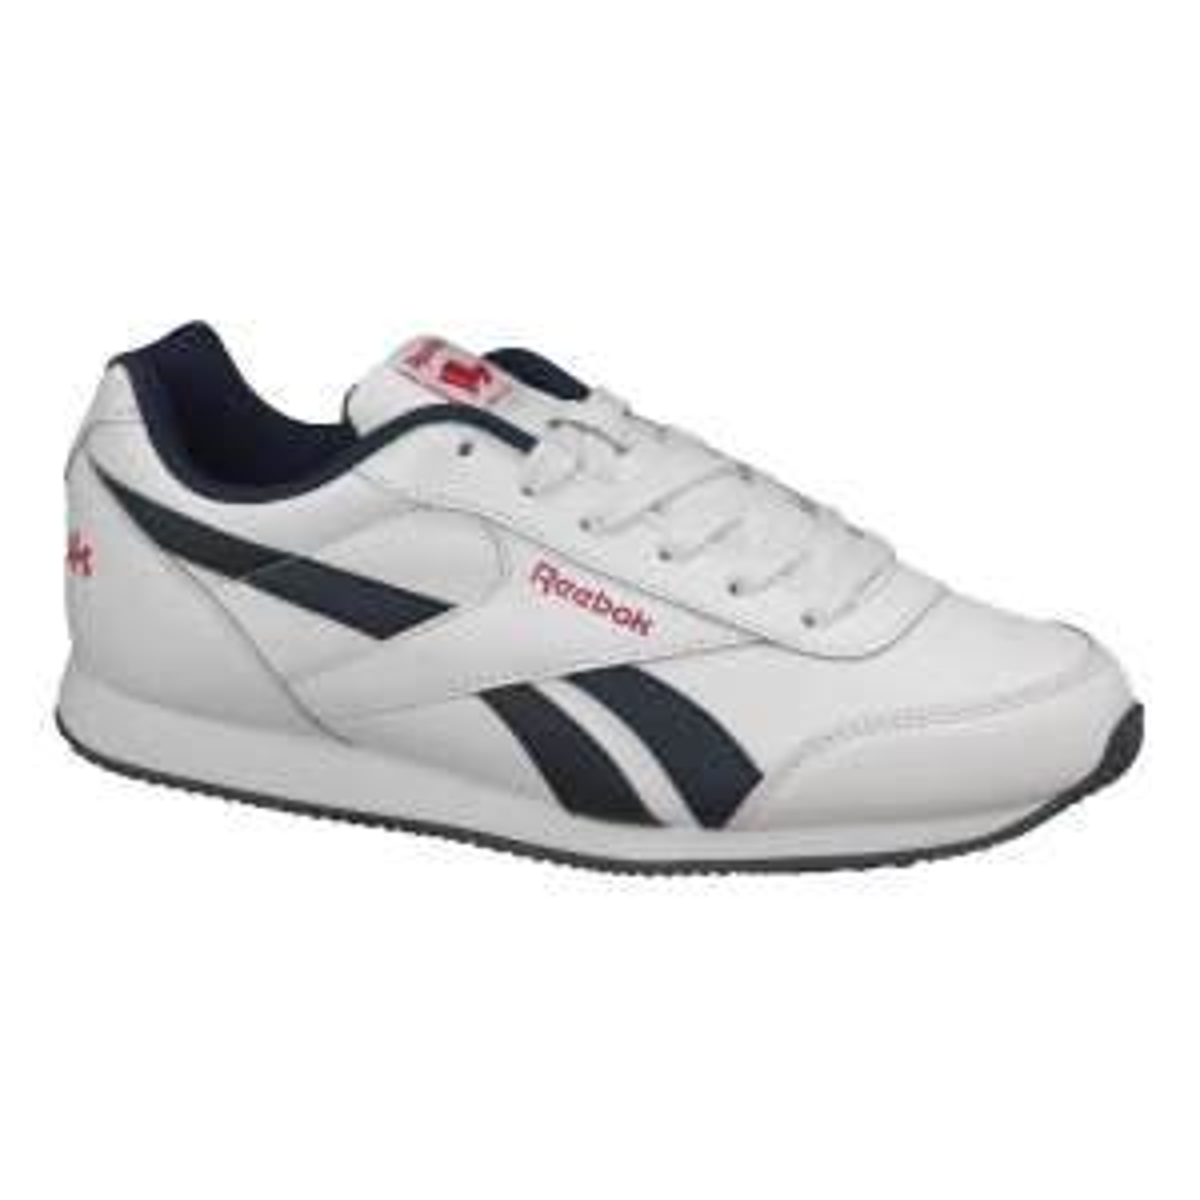 Chaussures enfant Reebok Royal Classic Jogger - Taille 31, 32, et 33